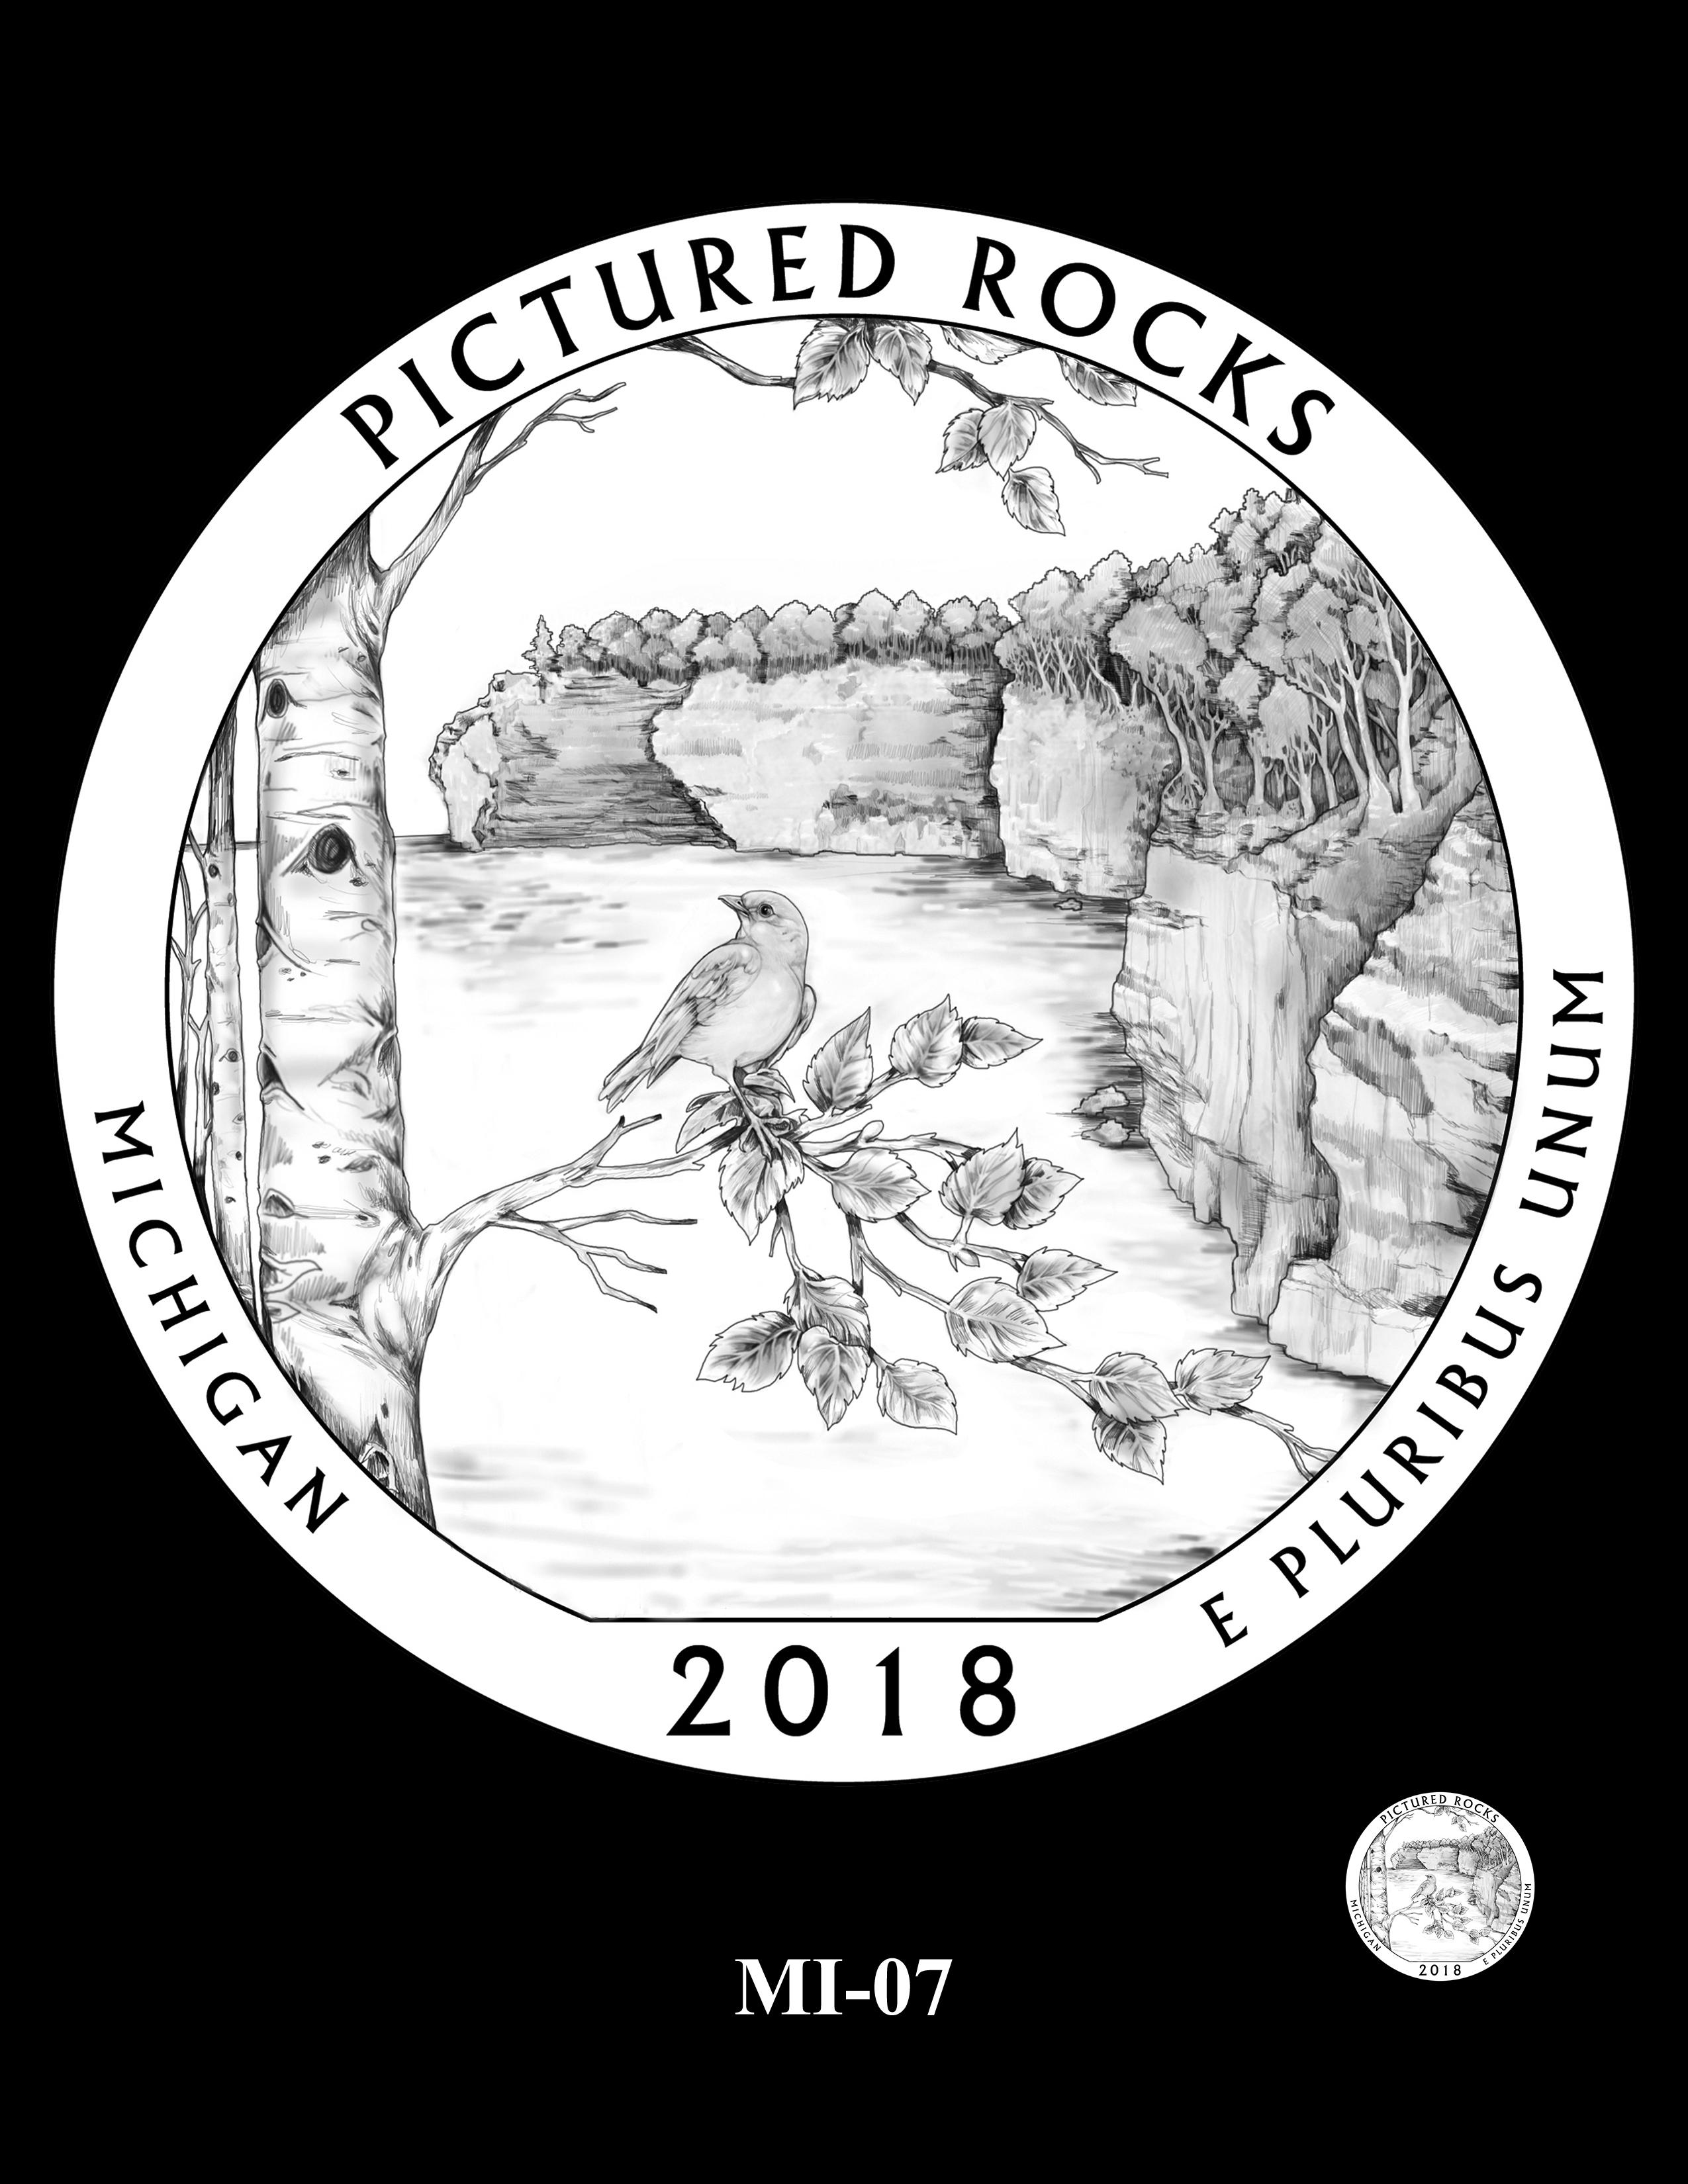 MI-07 -- 2018 America the Beautiful® Quarters Program